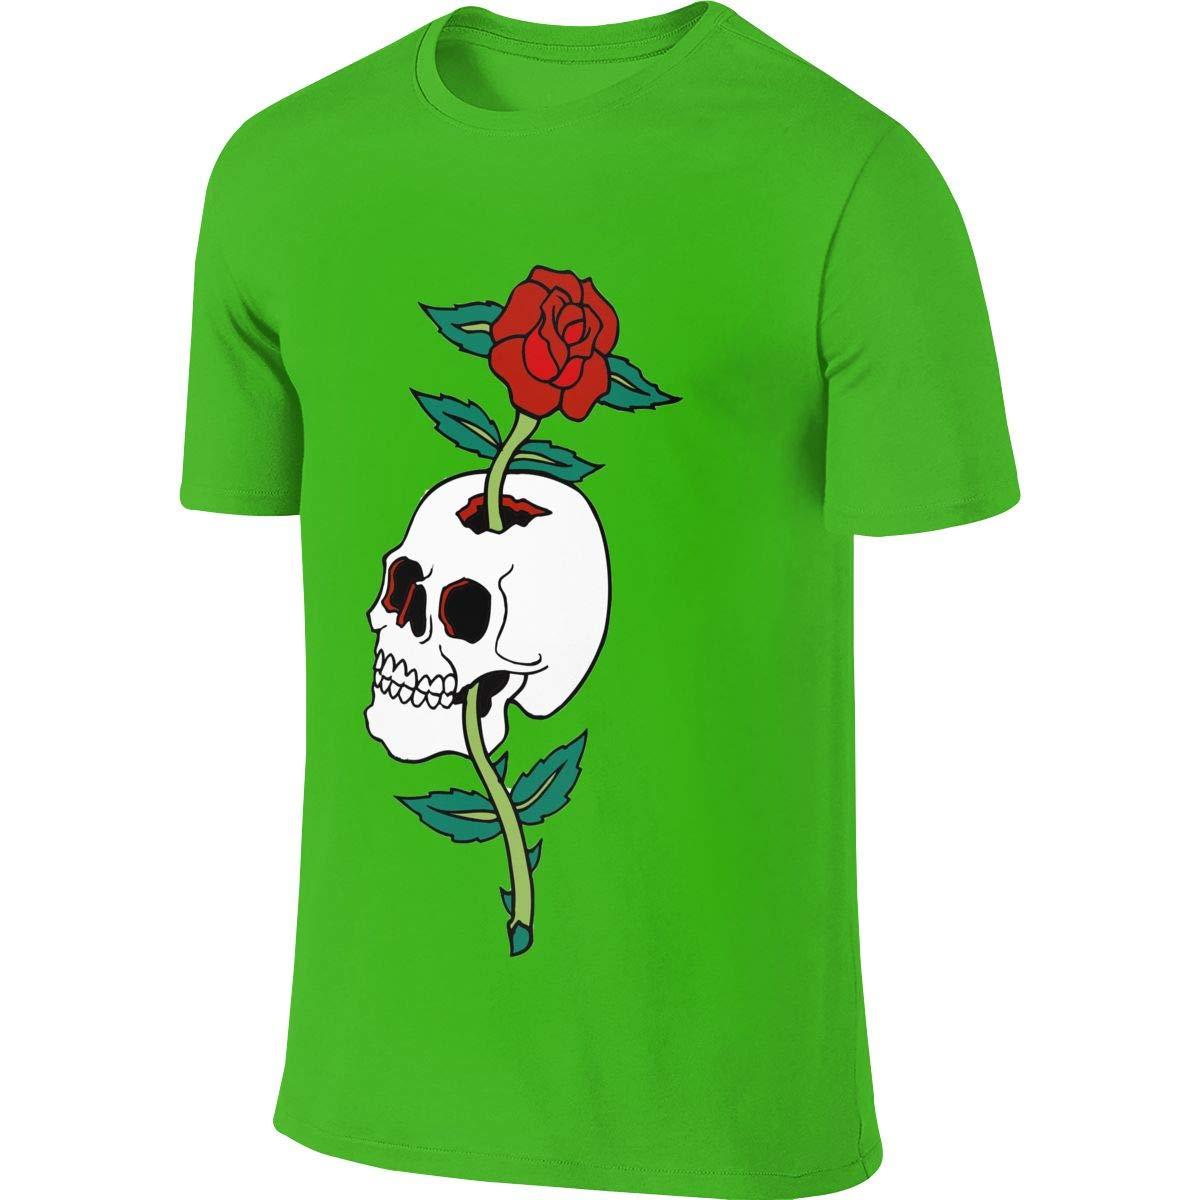 UauhOllxigm Skull Roses Mens Cotton Round Neck Short Sleeve T-Shirts